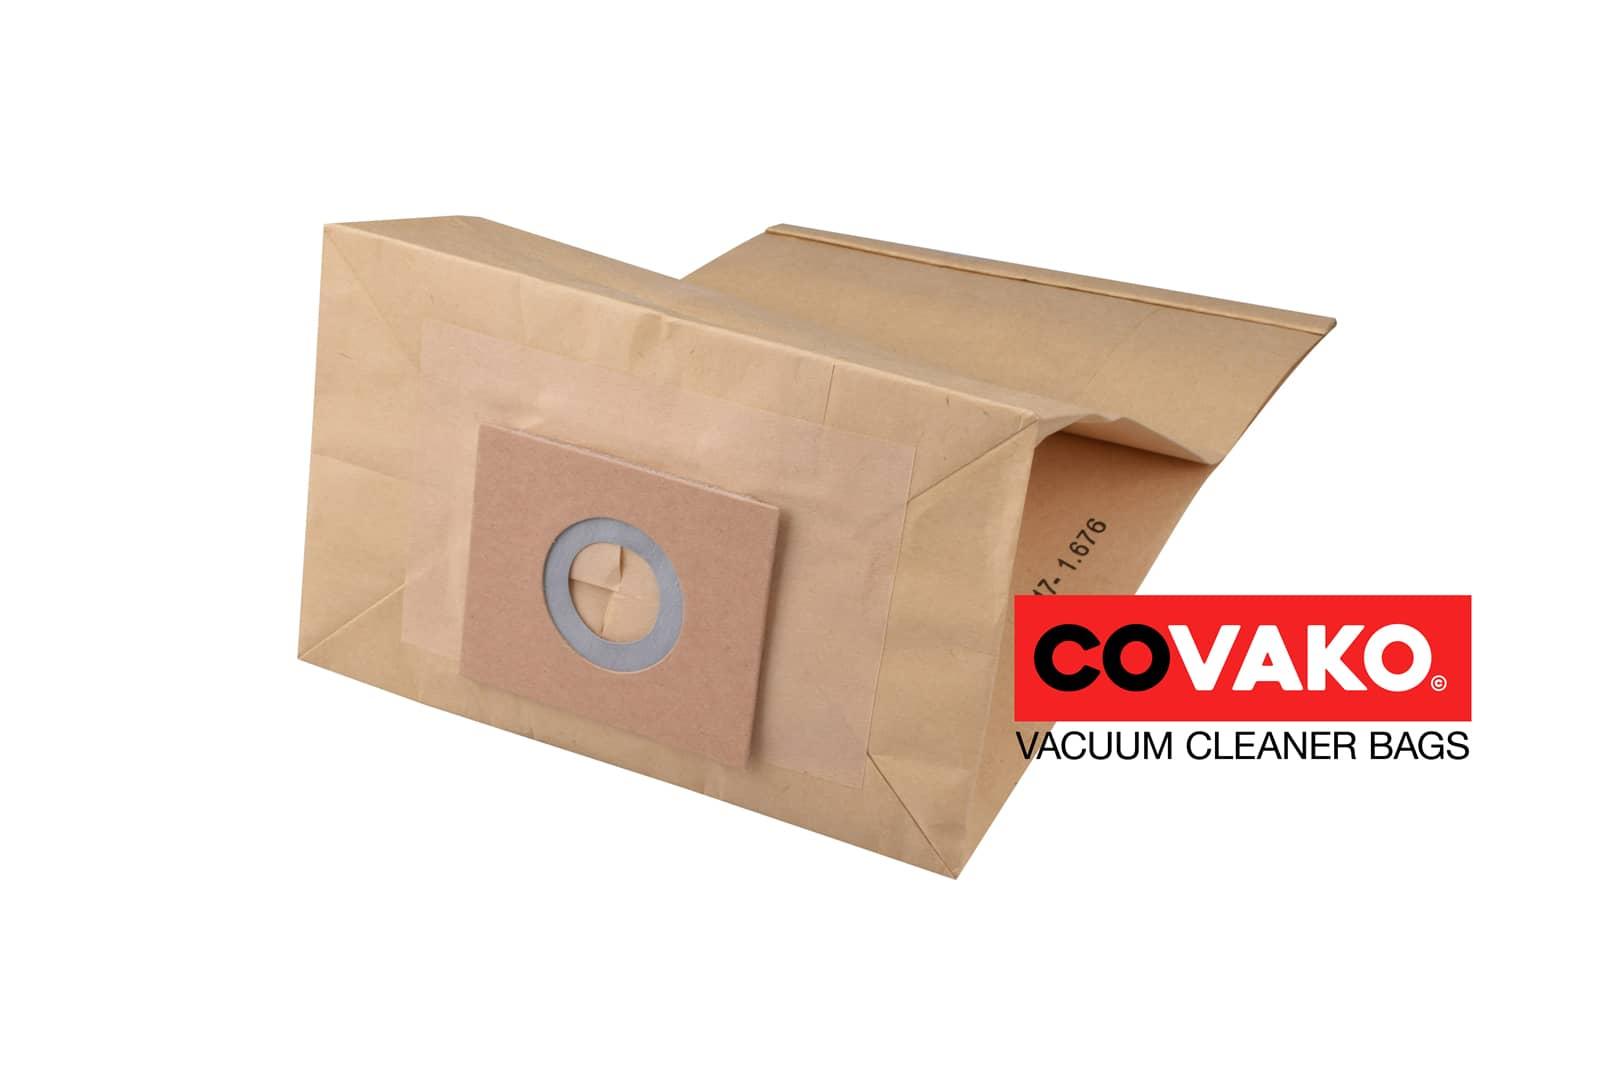 I-vac Dryver 15R / Paper - I-vac vacuum cleaner bags